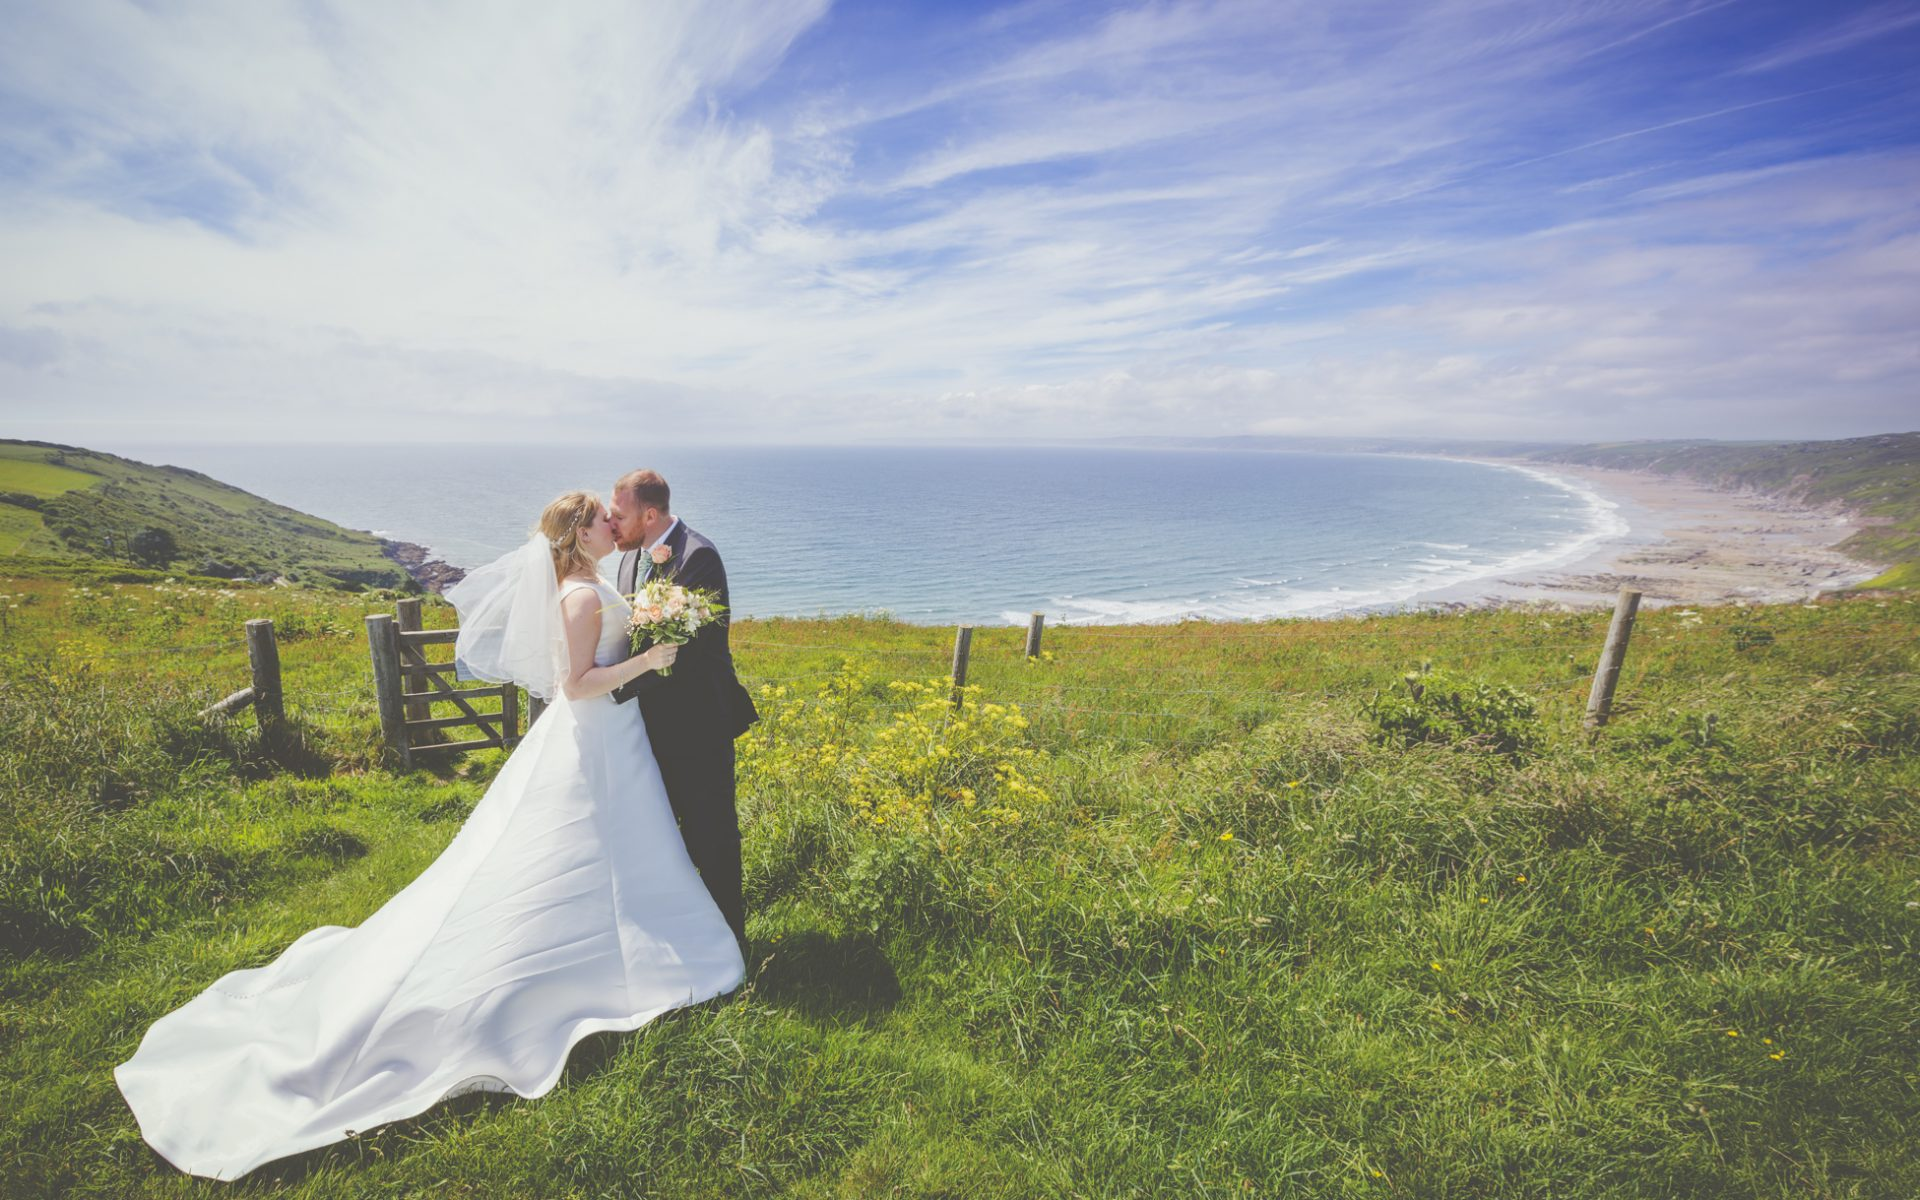 Cornwall wedding photography - Catrin & John